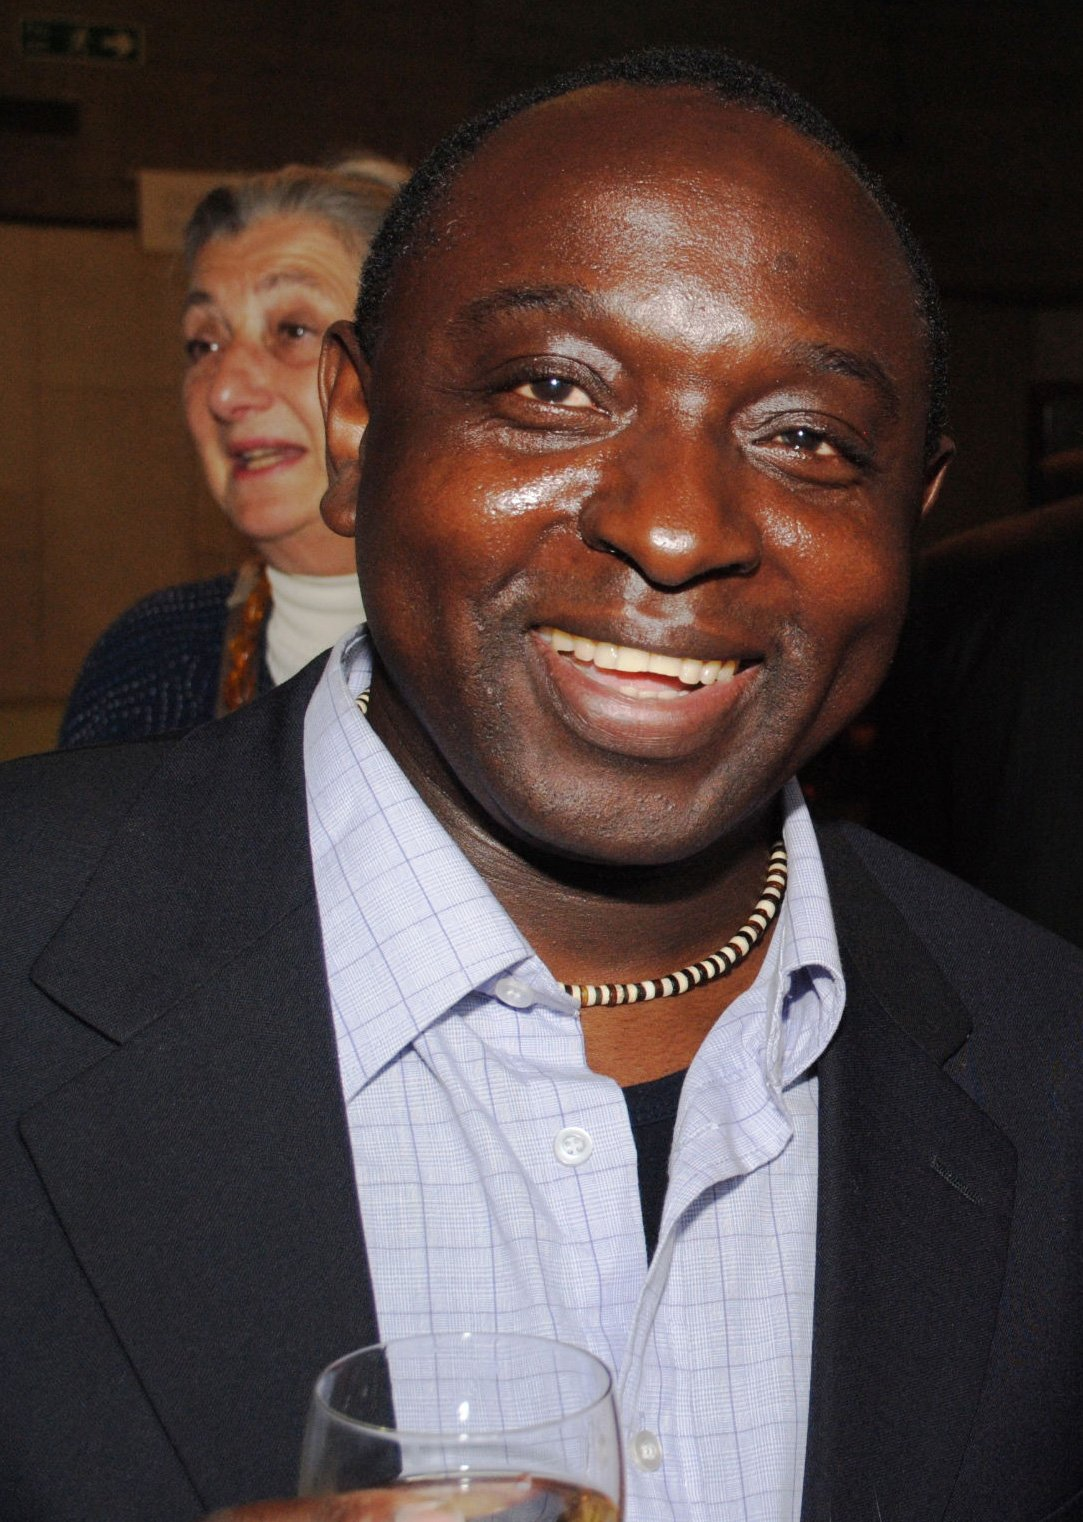 Juwon Ogungbe